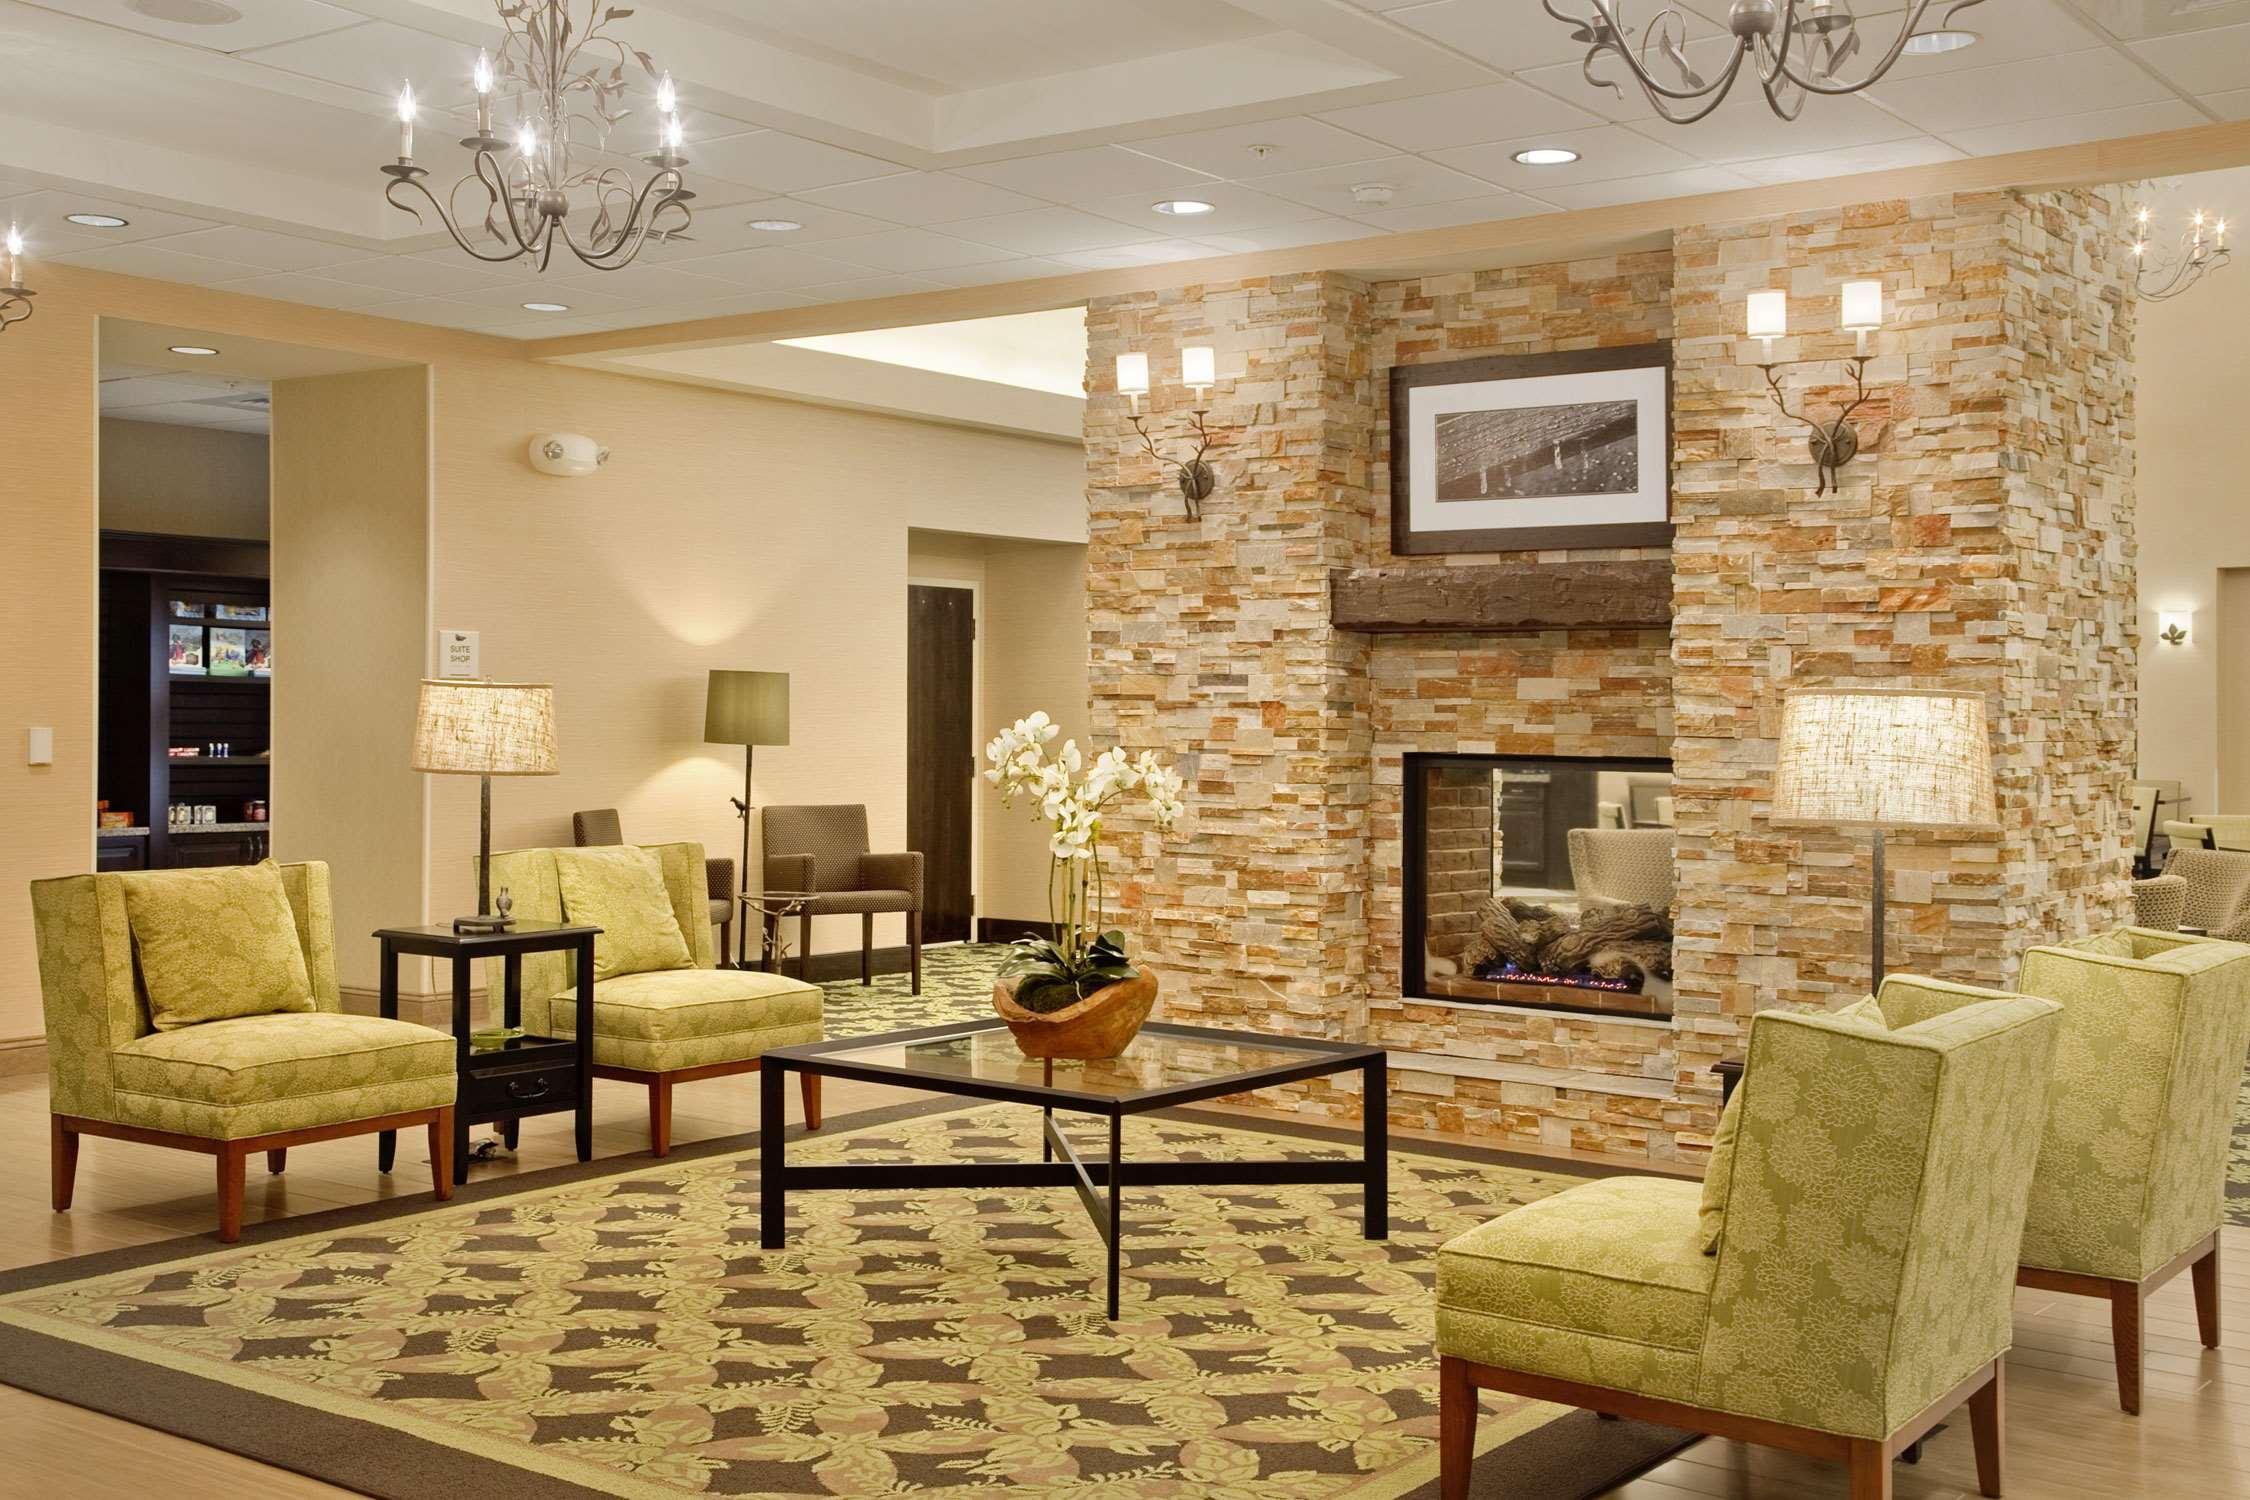 Homewood Suites by Hilton Charlotte/Ayrsley, NC image 2